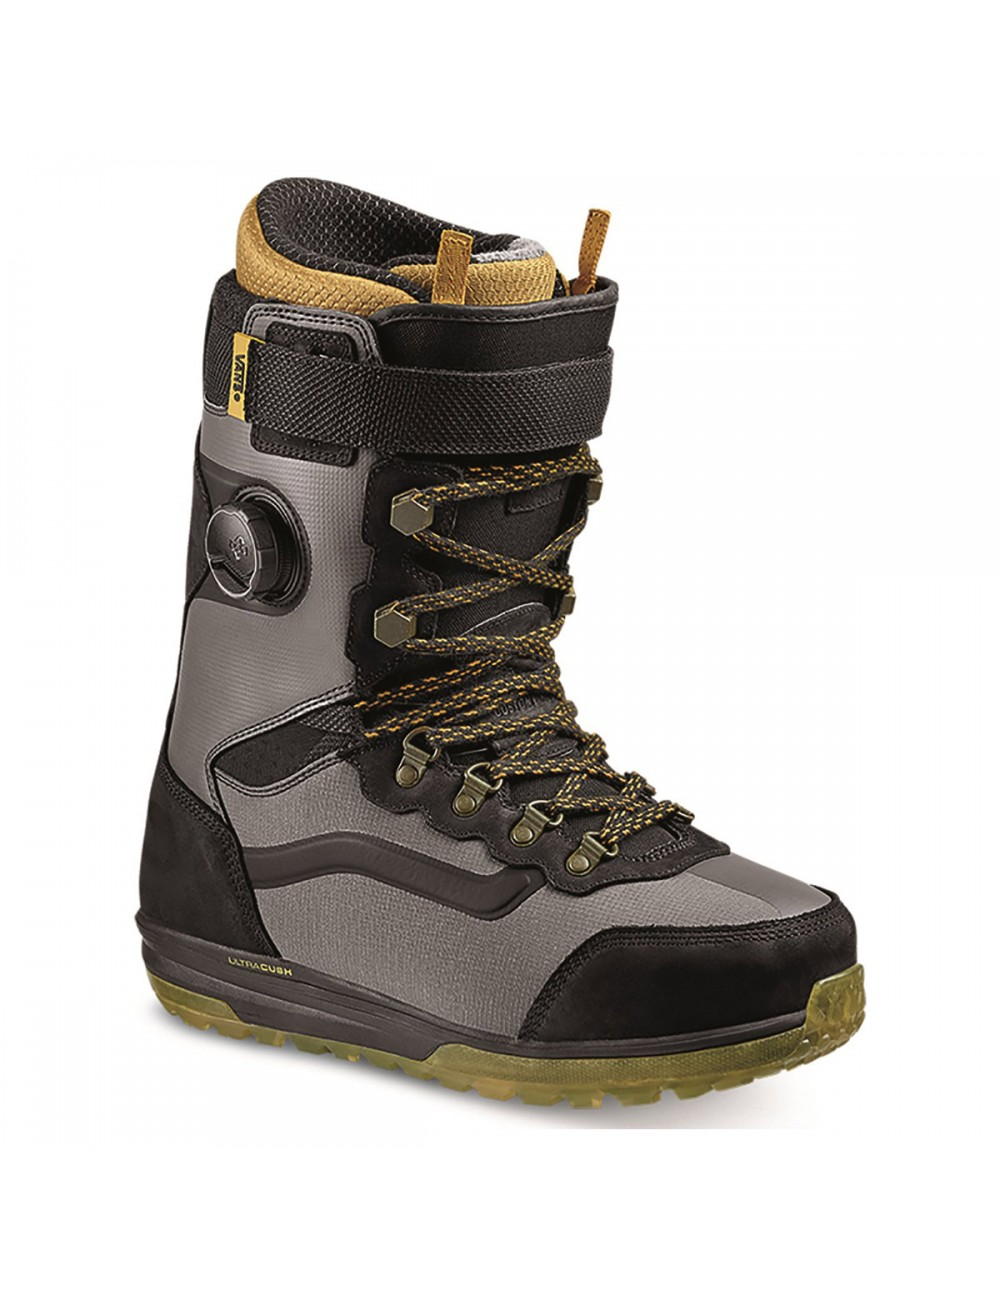 Vans Infuse Boot_1000756